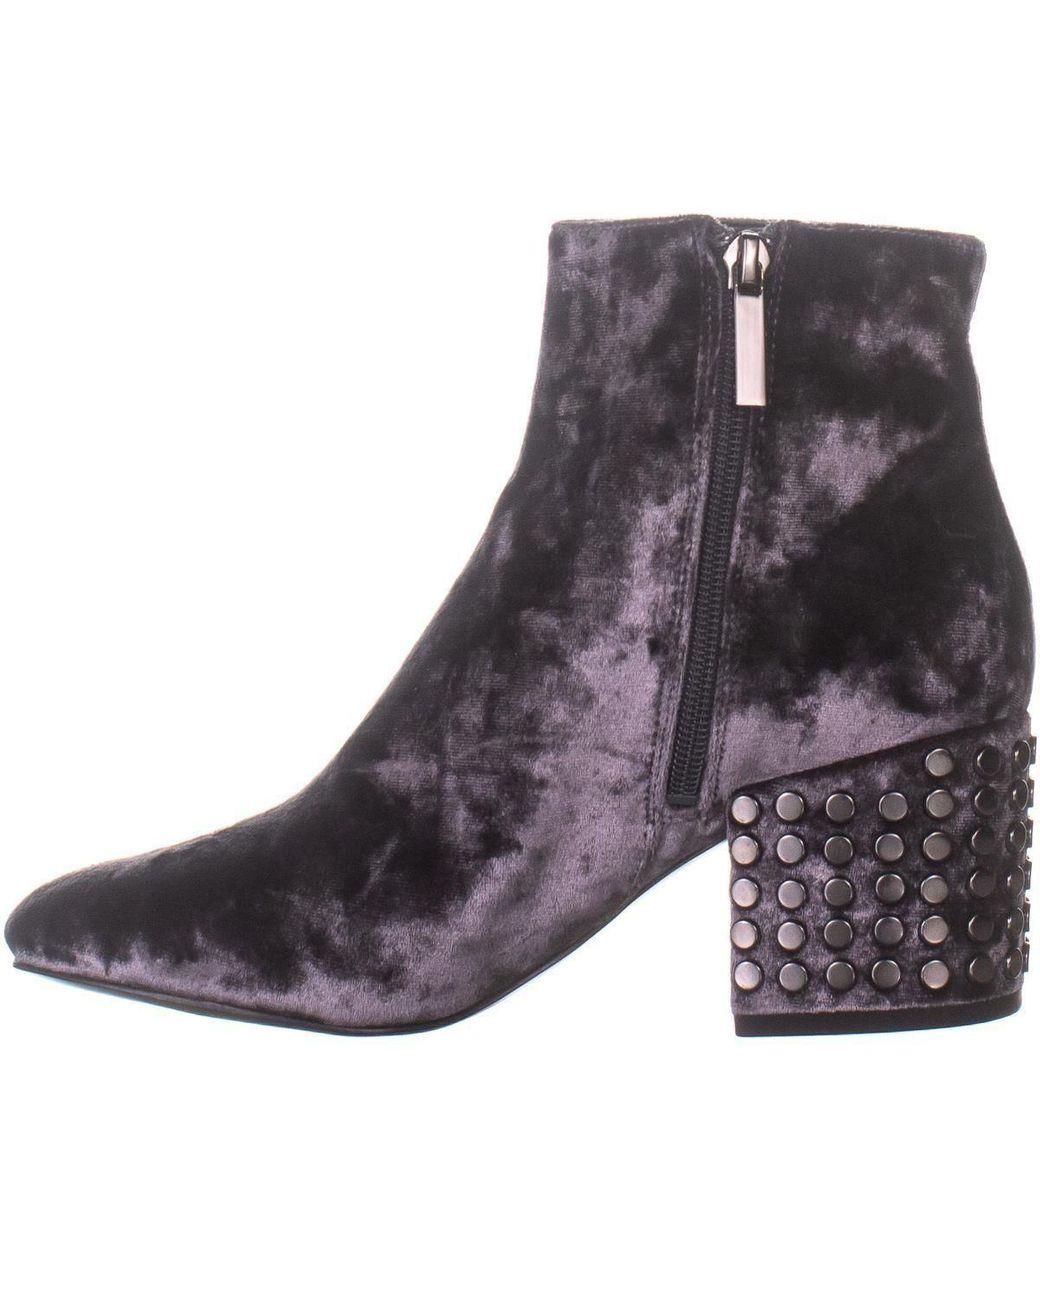 Kylie Blythe Women/'s Ankle High Block Heel Boots Kendall